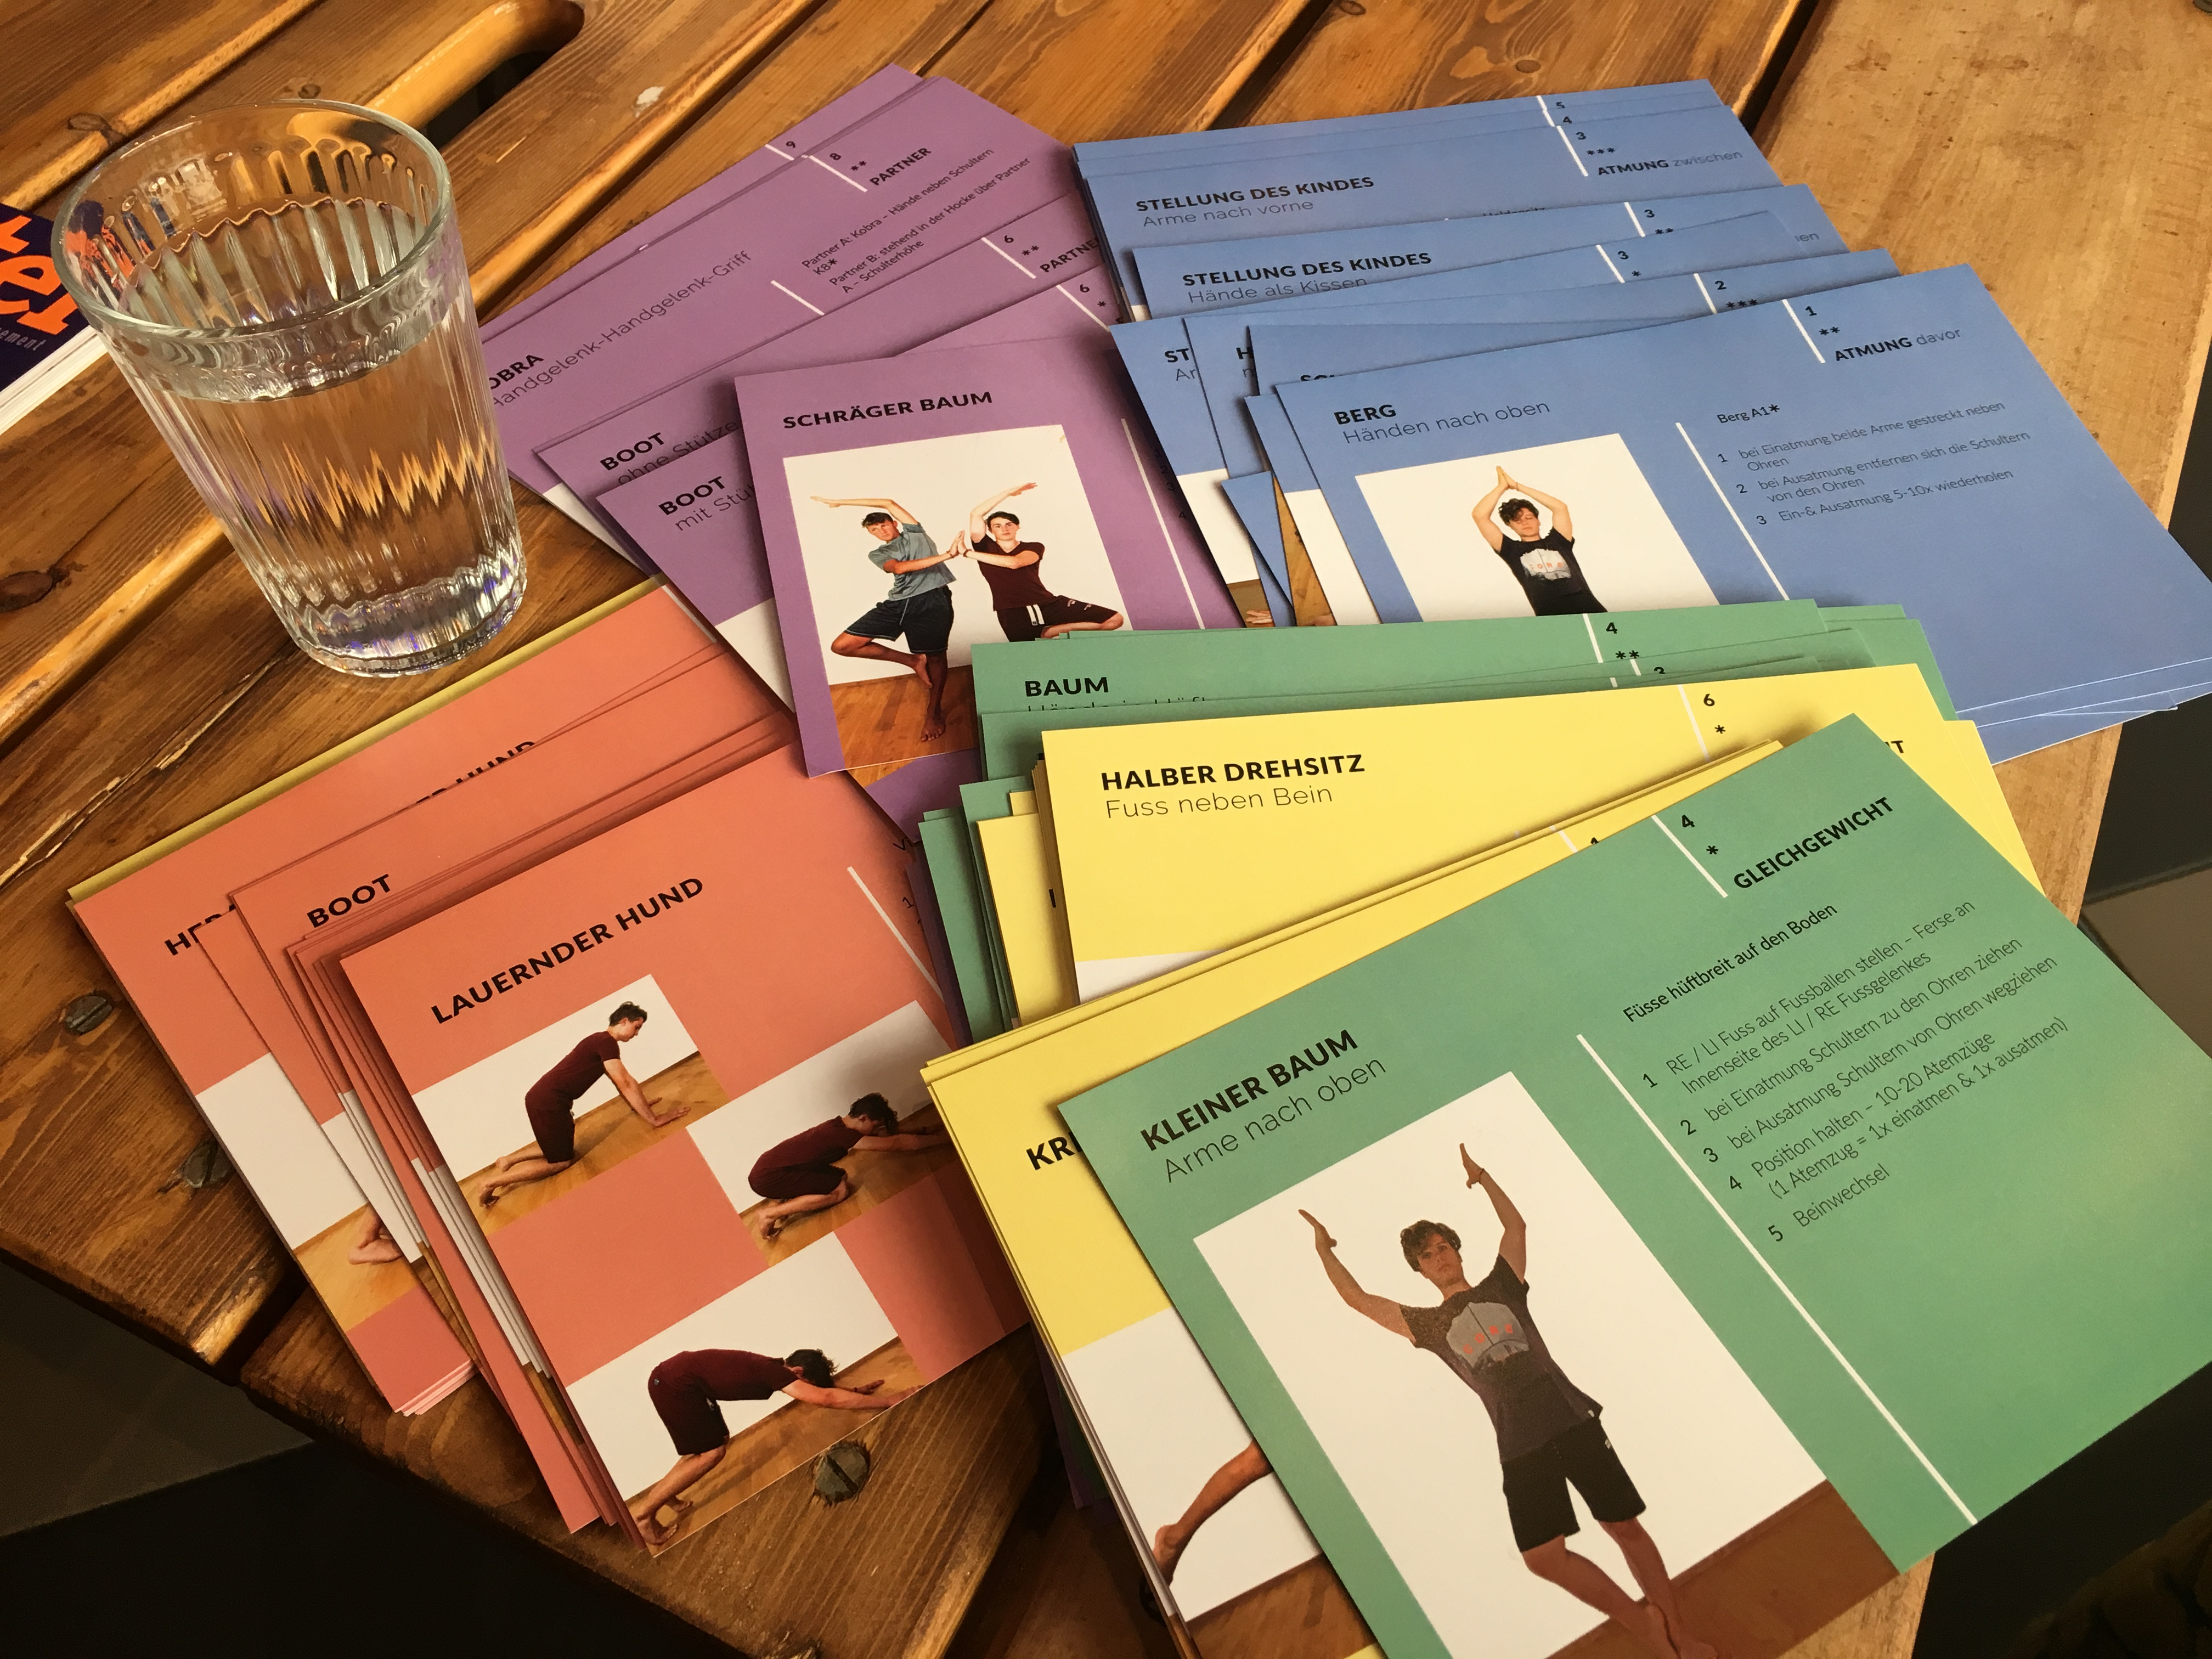 Yoga lernkarten f r die schule design thinking for Schule design